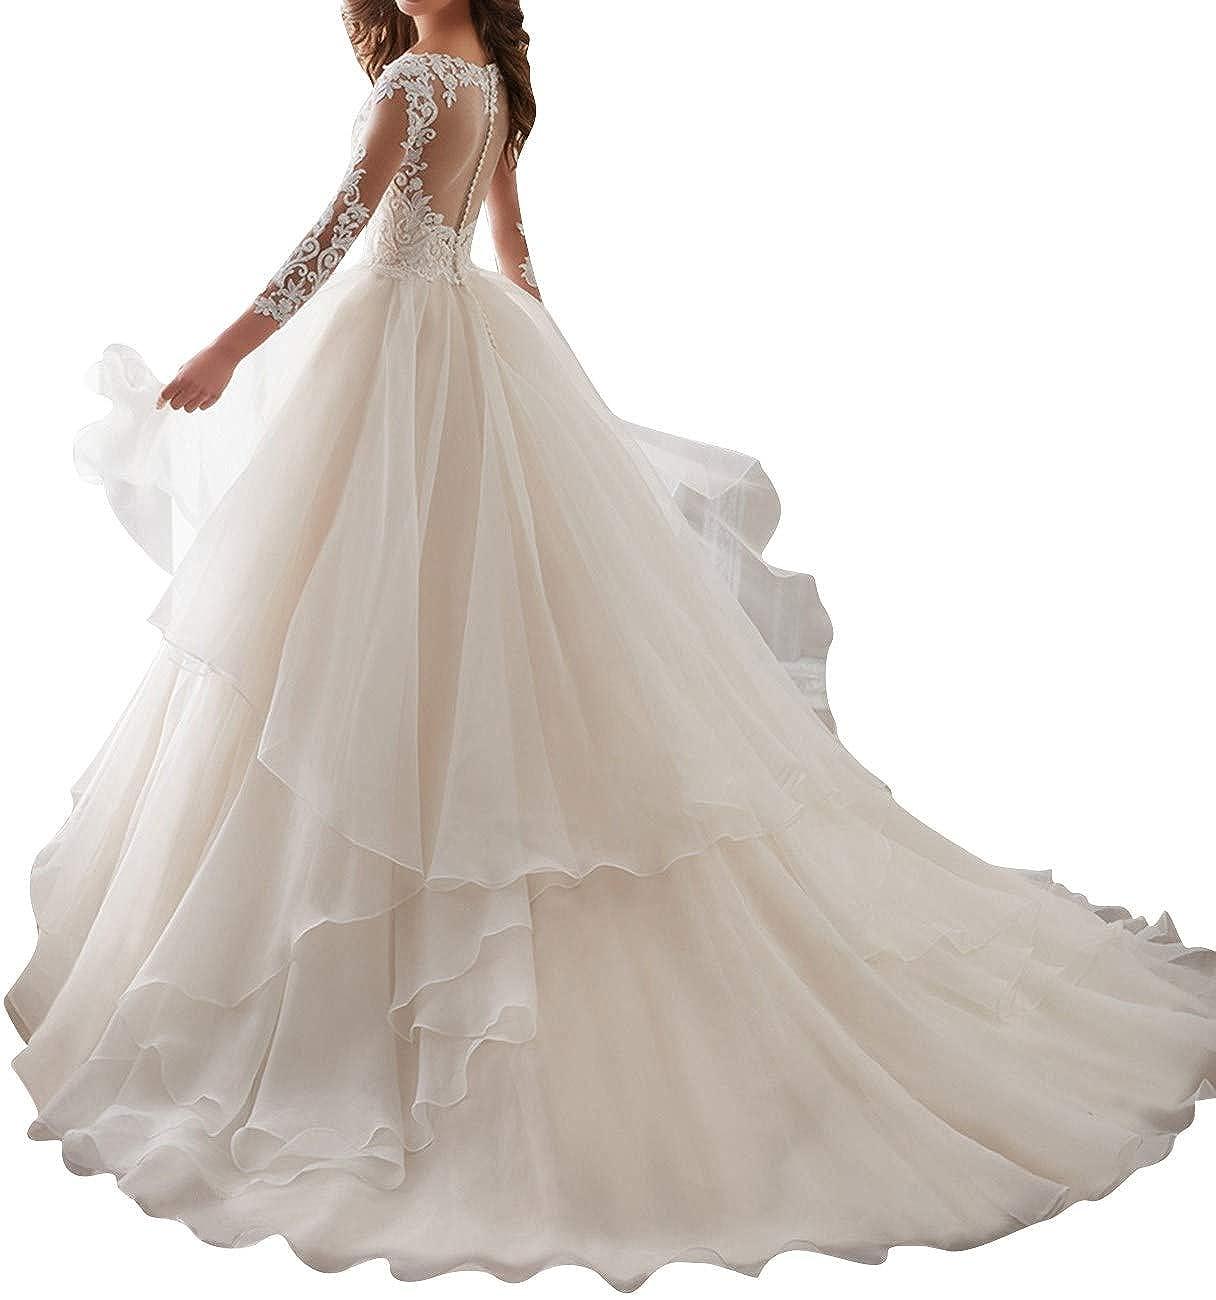 d3b6c58132a Long Sleeve Wedding Dress Sheer Lace